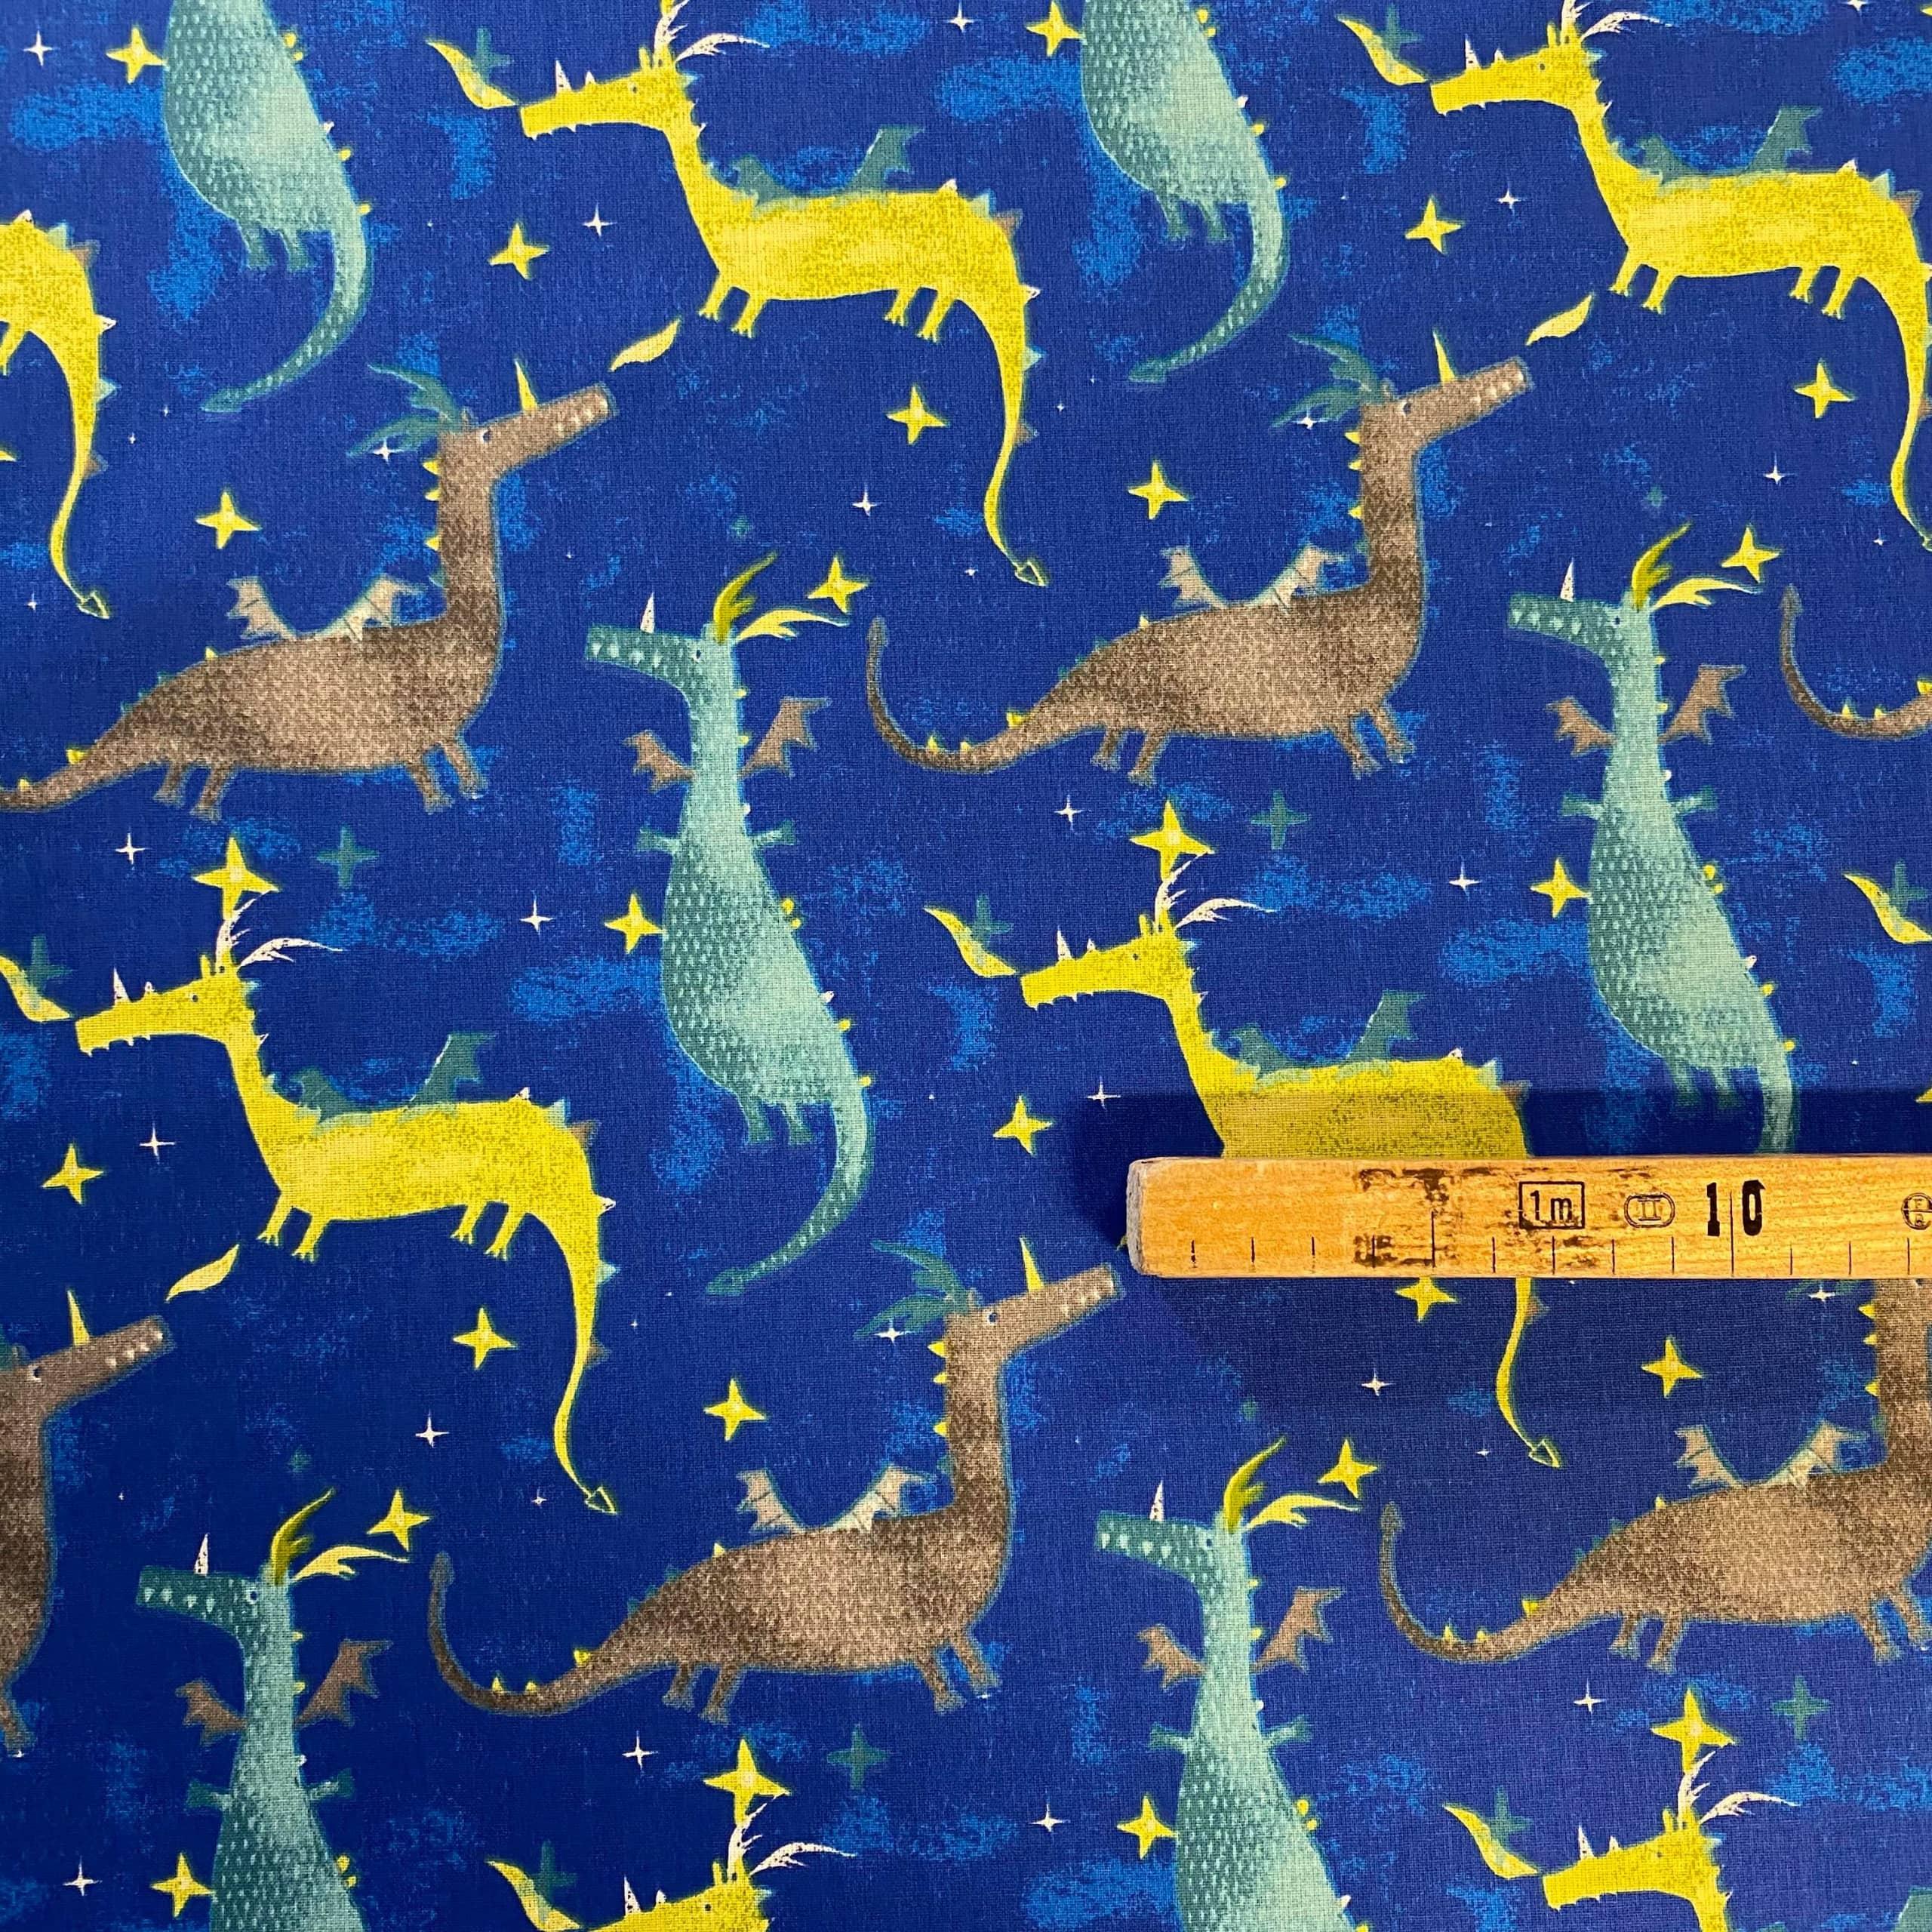 Tissu coton imprimé dragon mètre